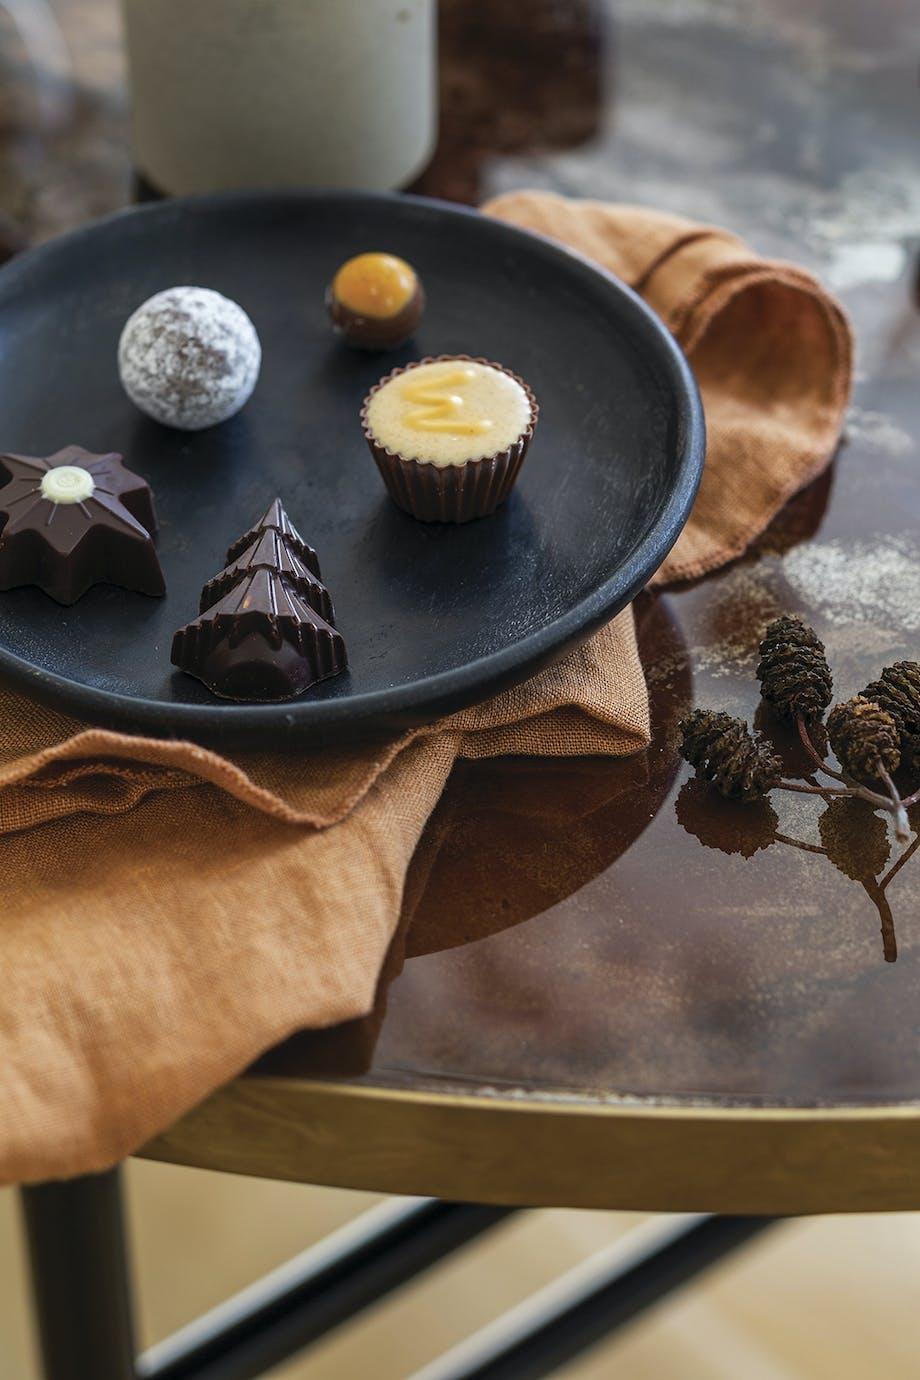 konfekt bordpynt chokolade